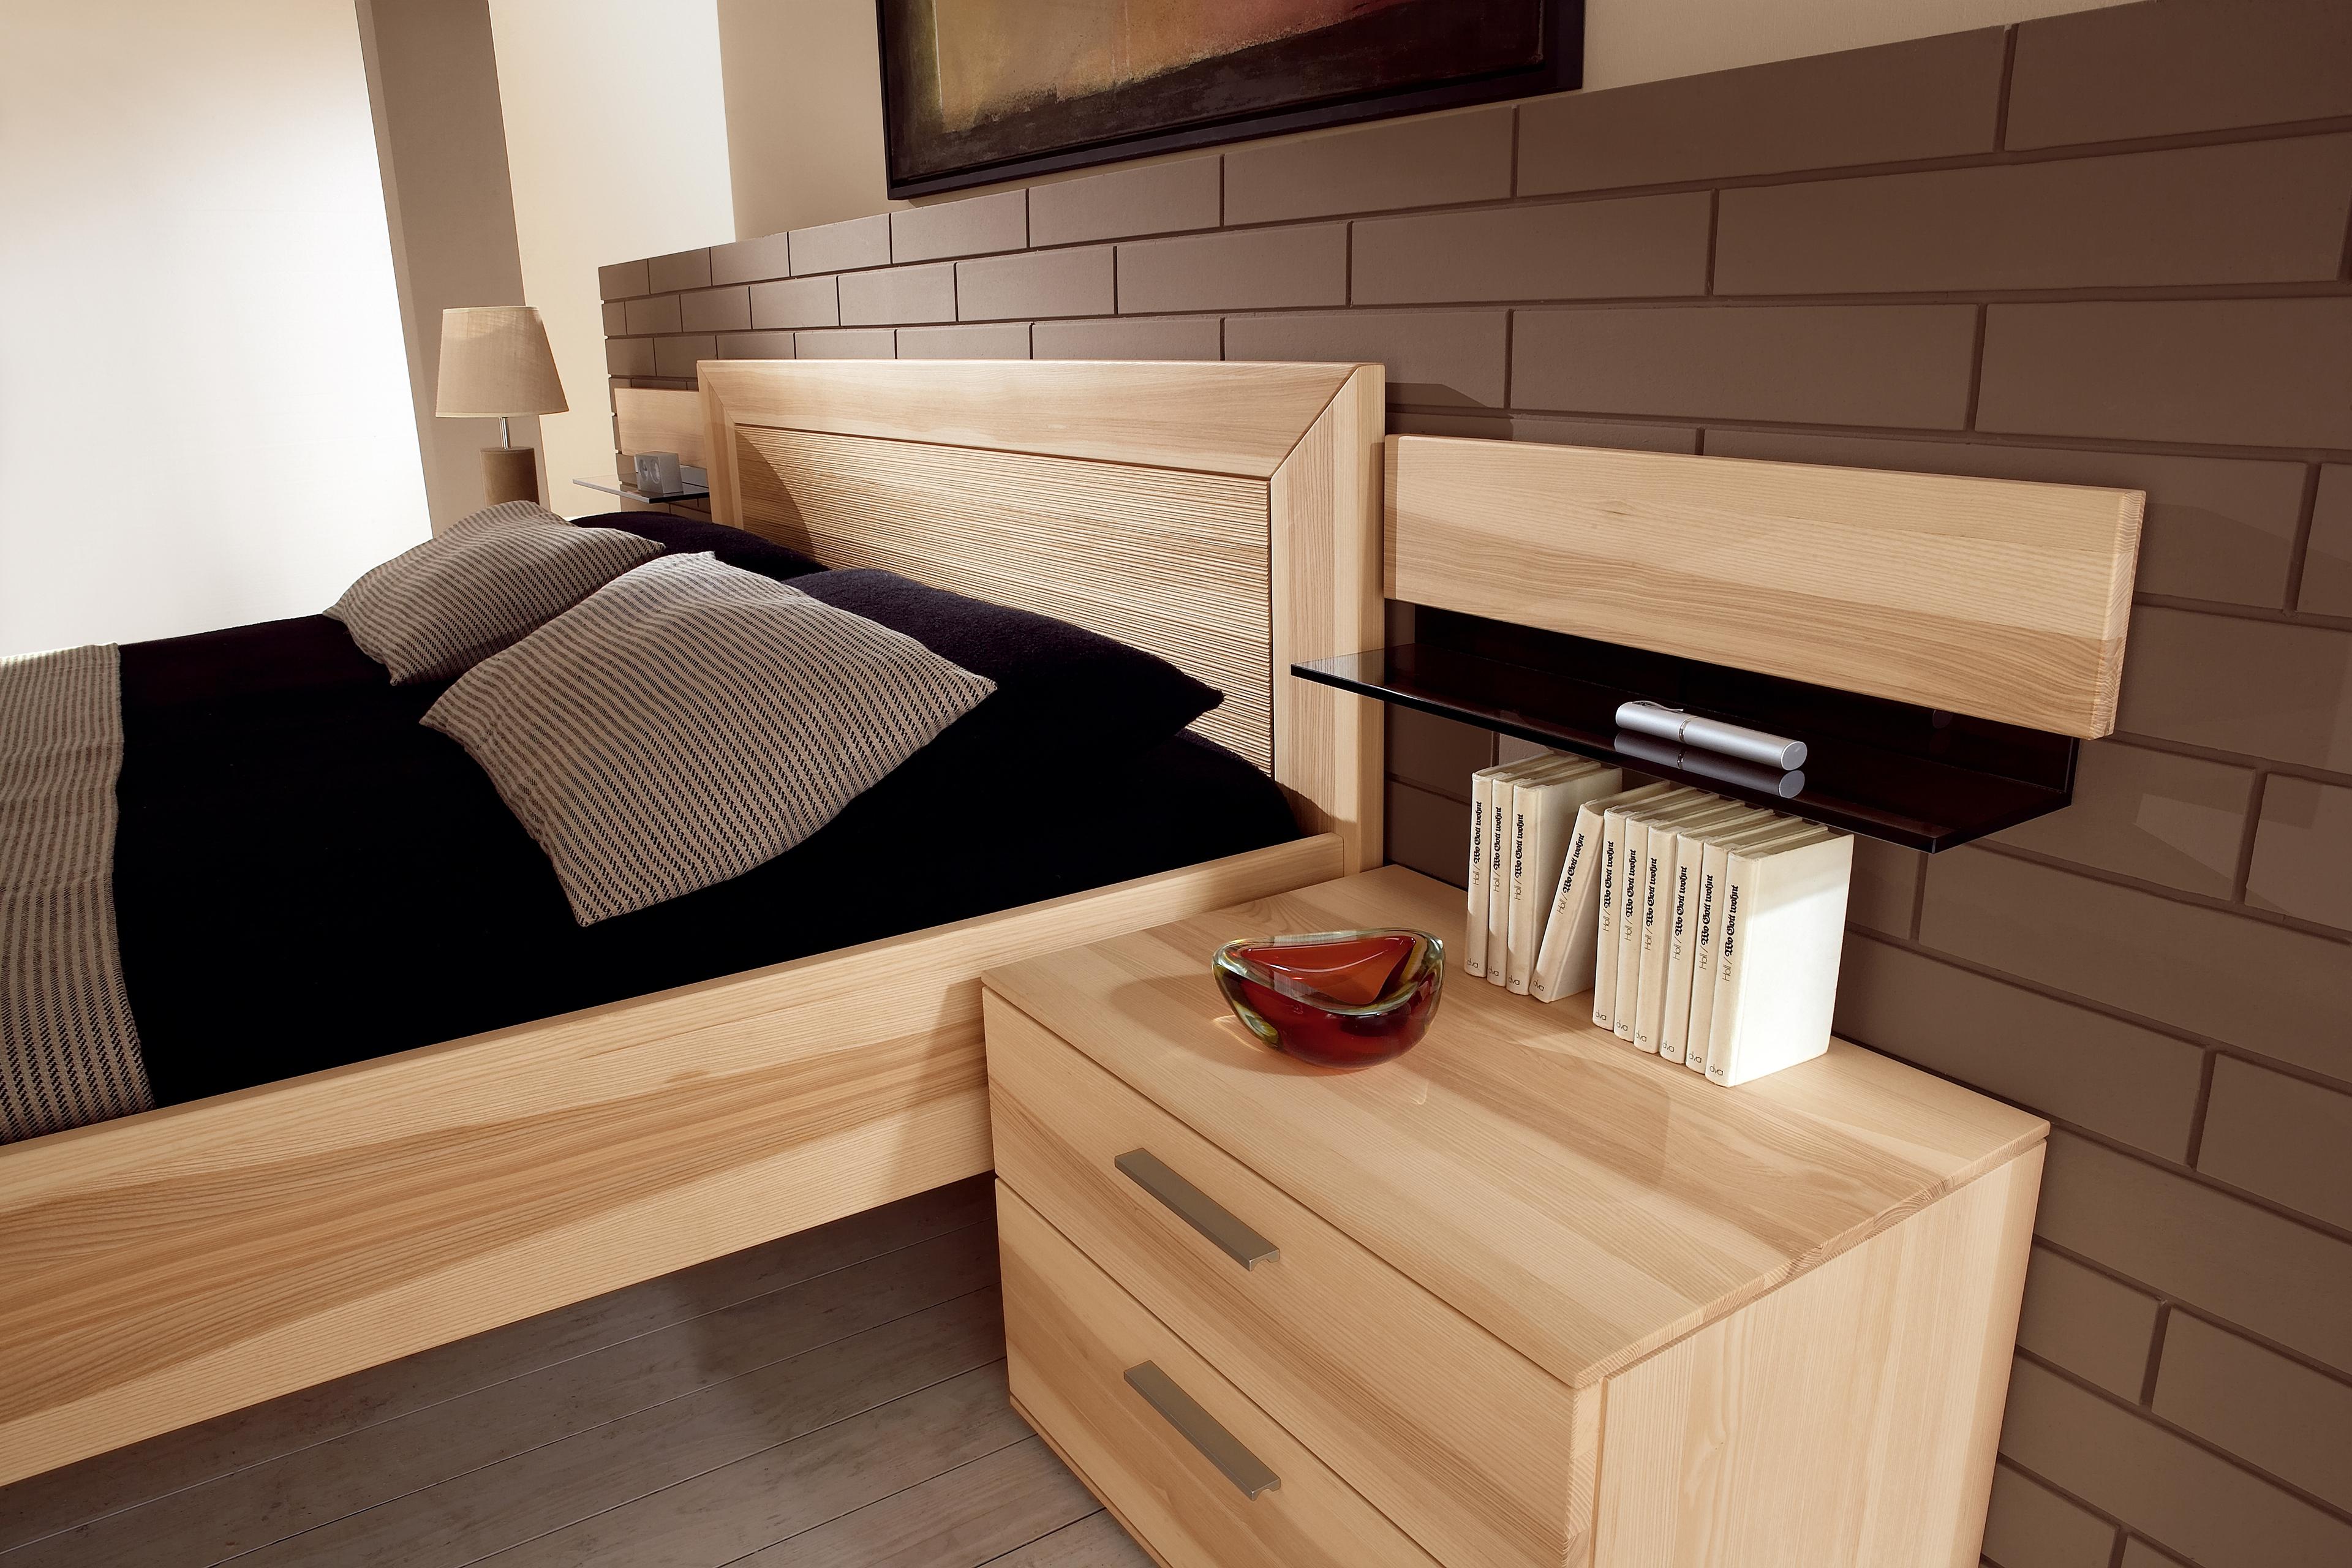 thielemeyer schlafzimmer mali strukturesche massiv m bel. Black Bedroom Furniture Sets. Home Design Ideas